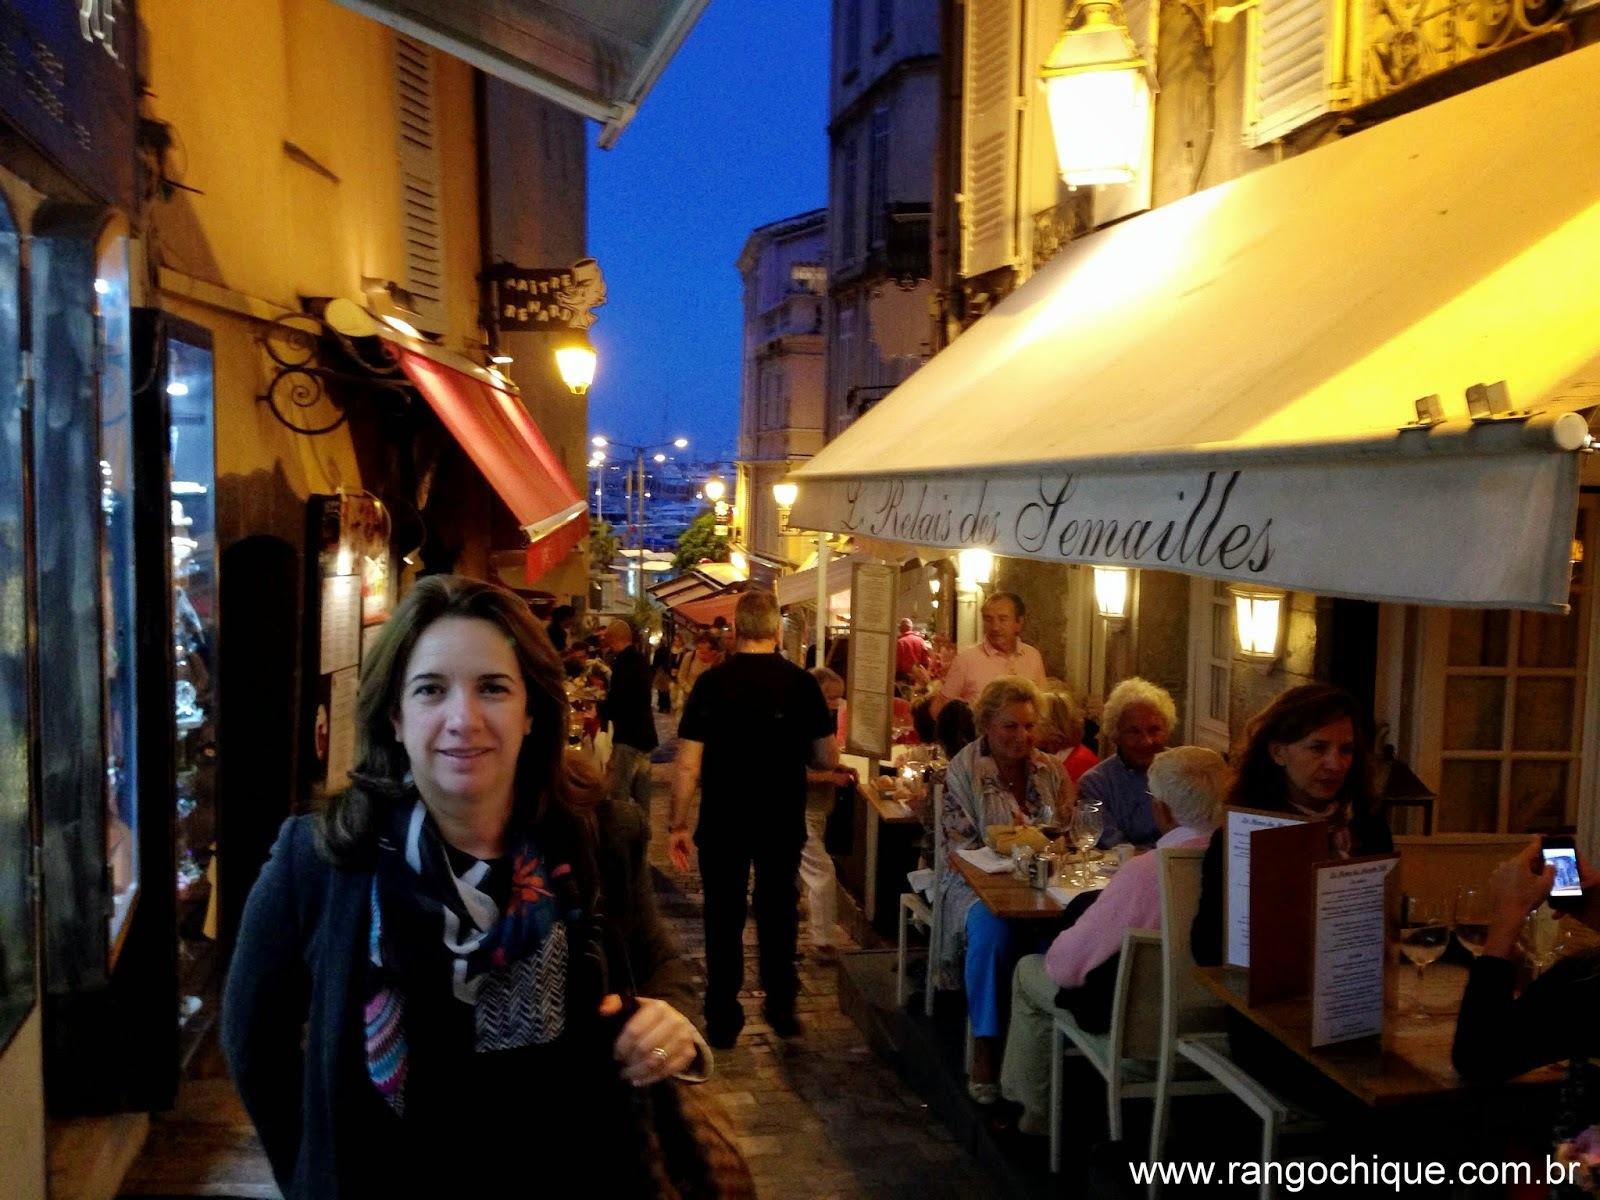 Costa Azul/Riviera Francesa  - Cannes - Nice - Monte Carlos - Grasse e Saint-Tropez